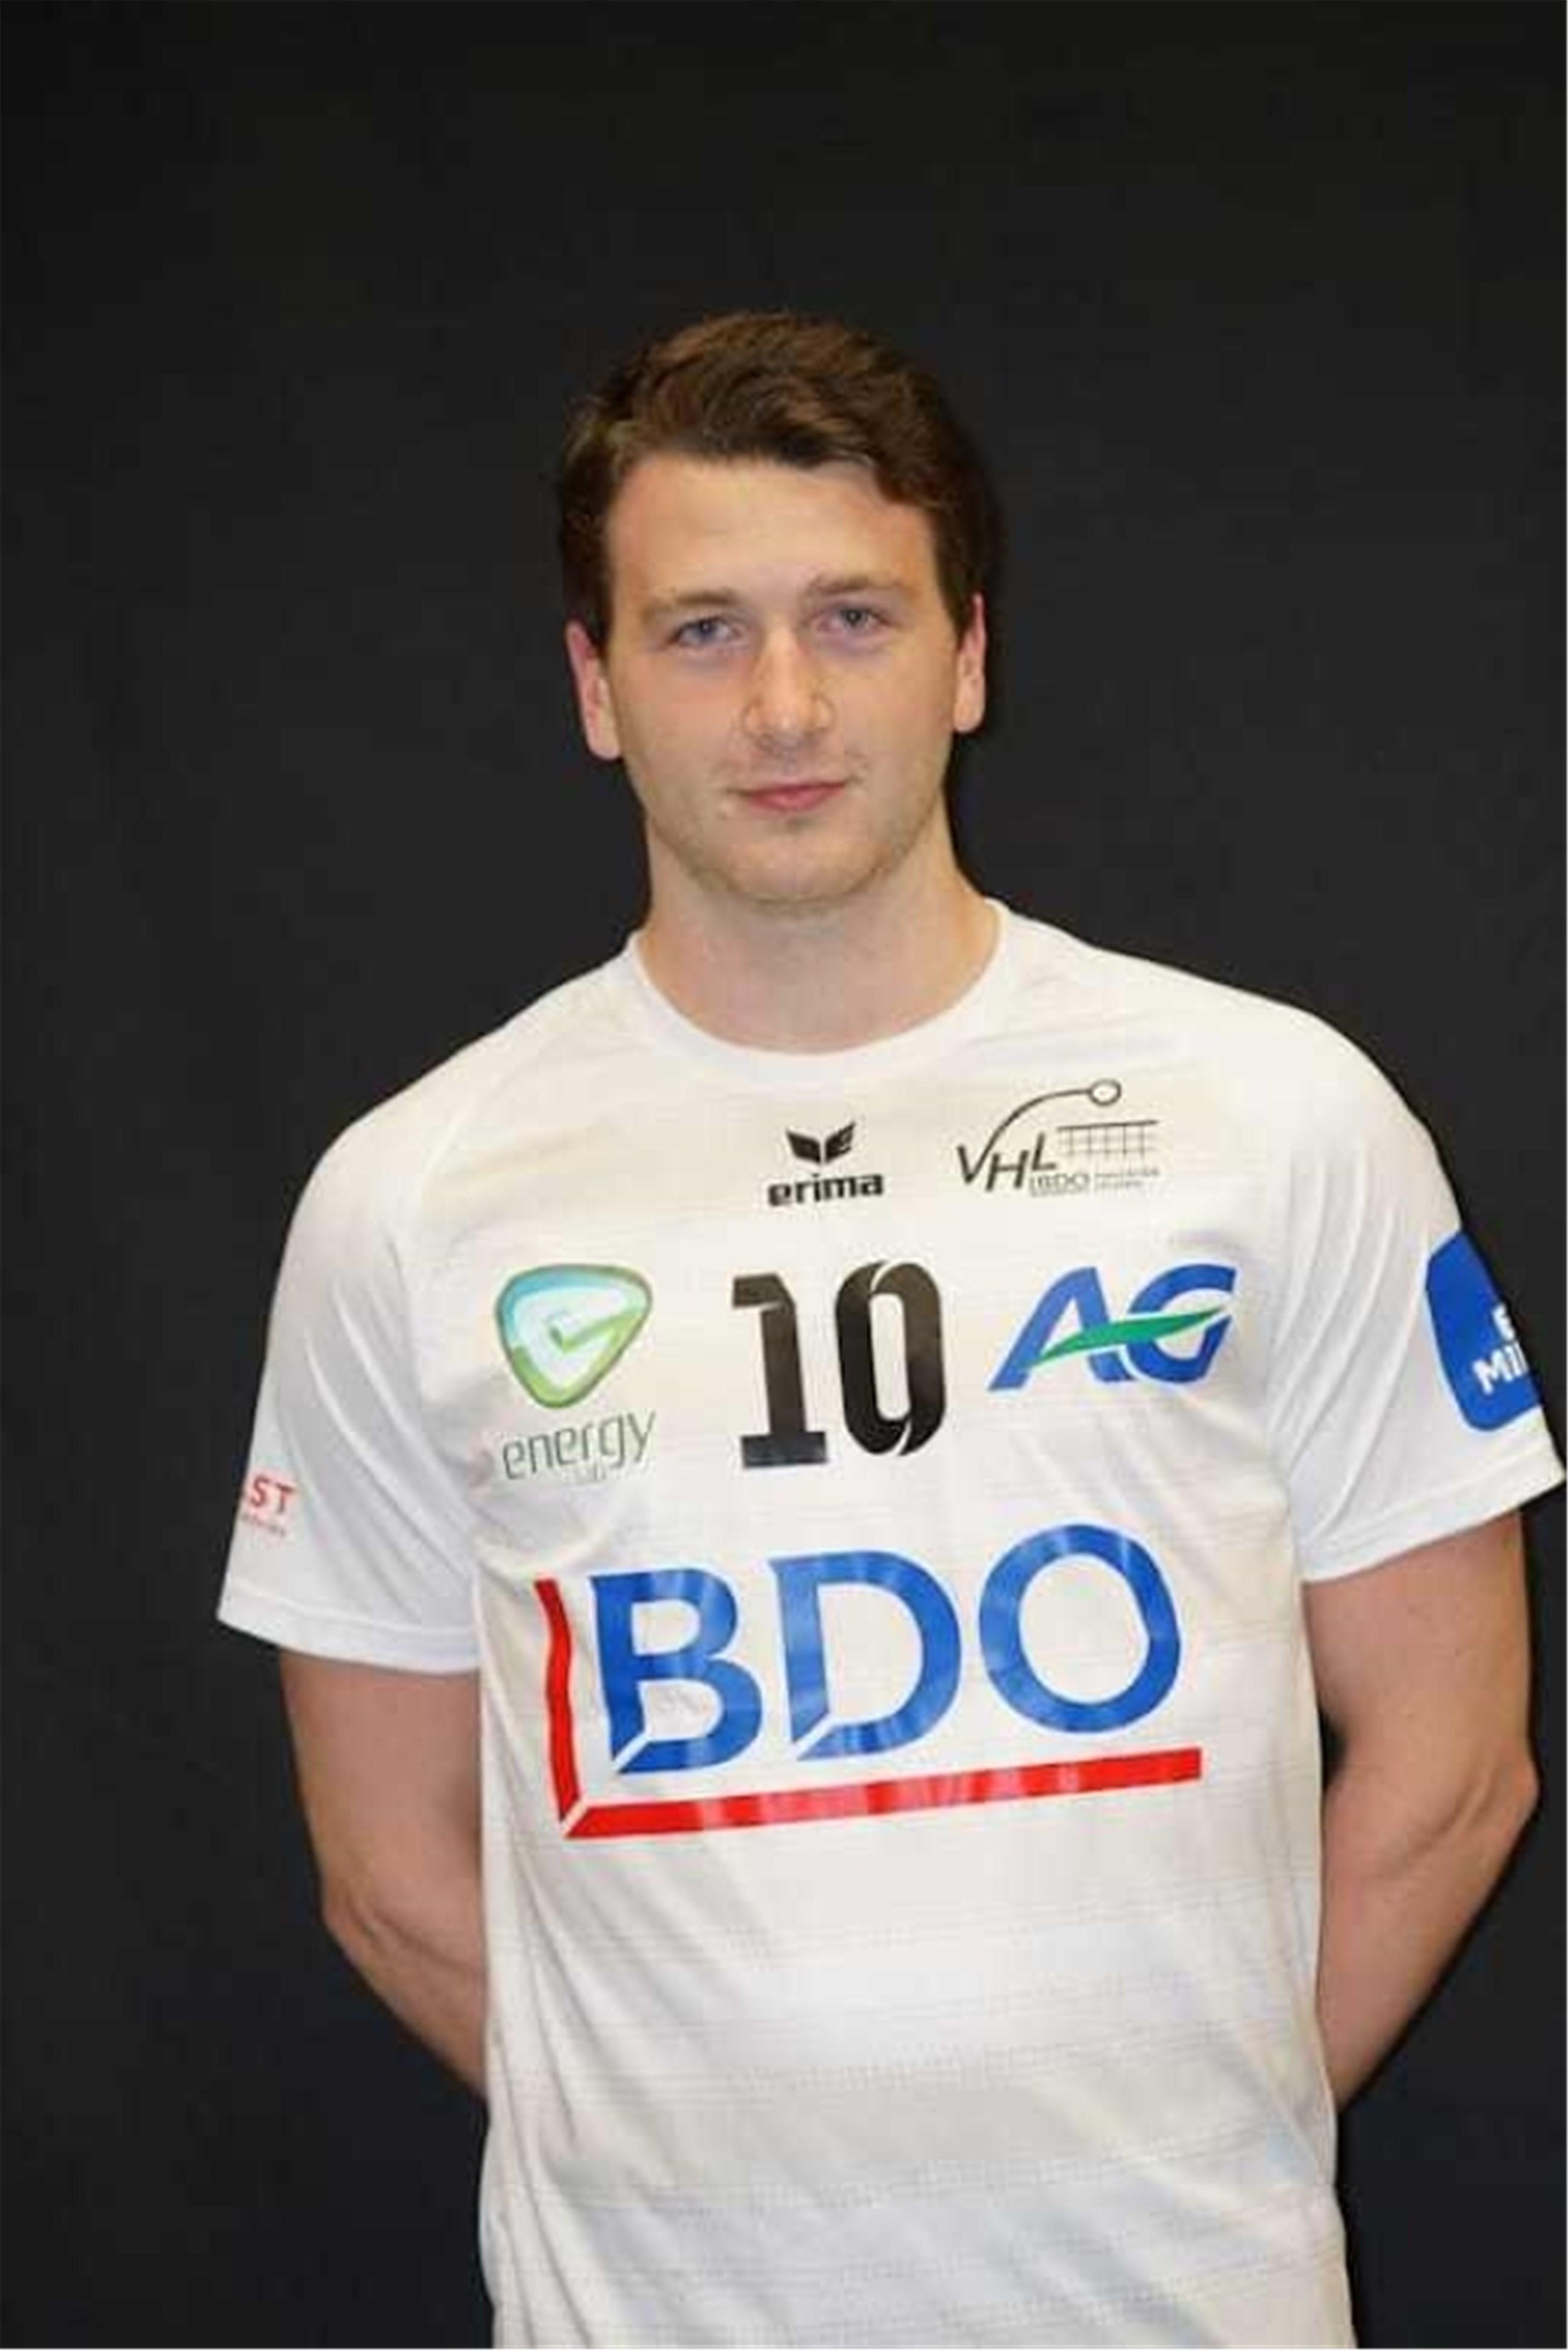 Photo of Christophe WITVROUWEN